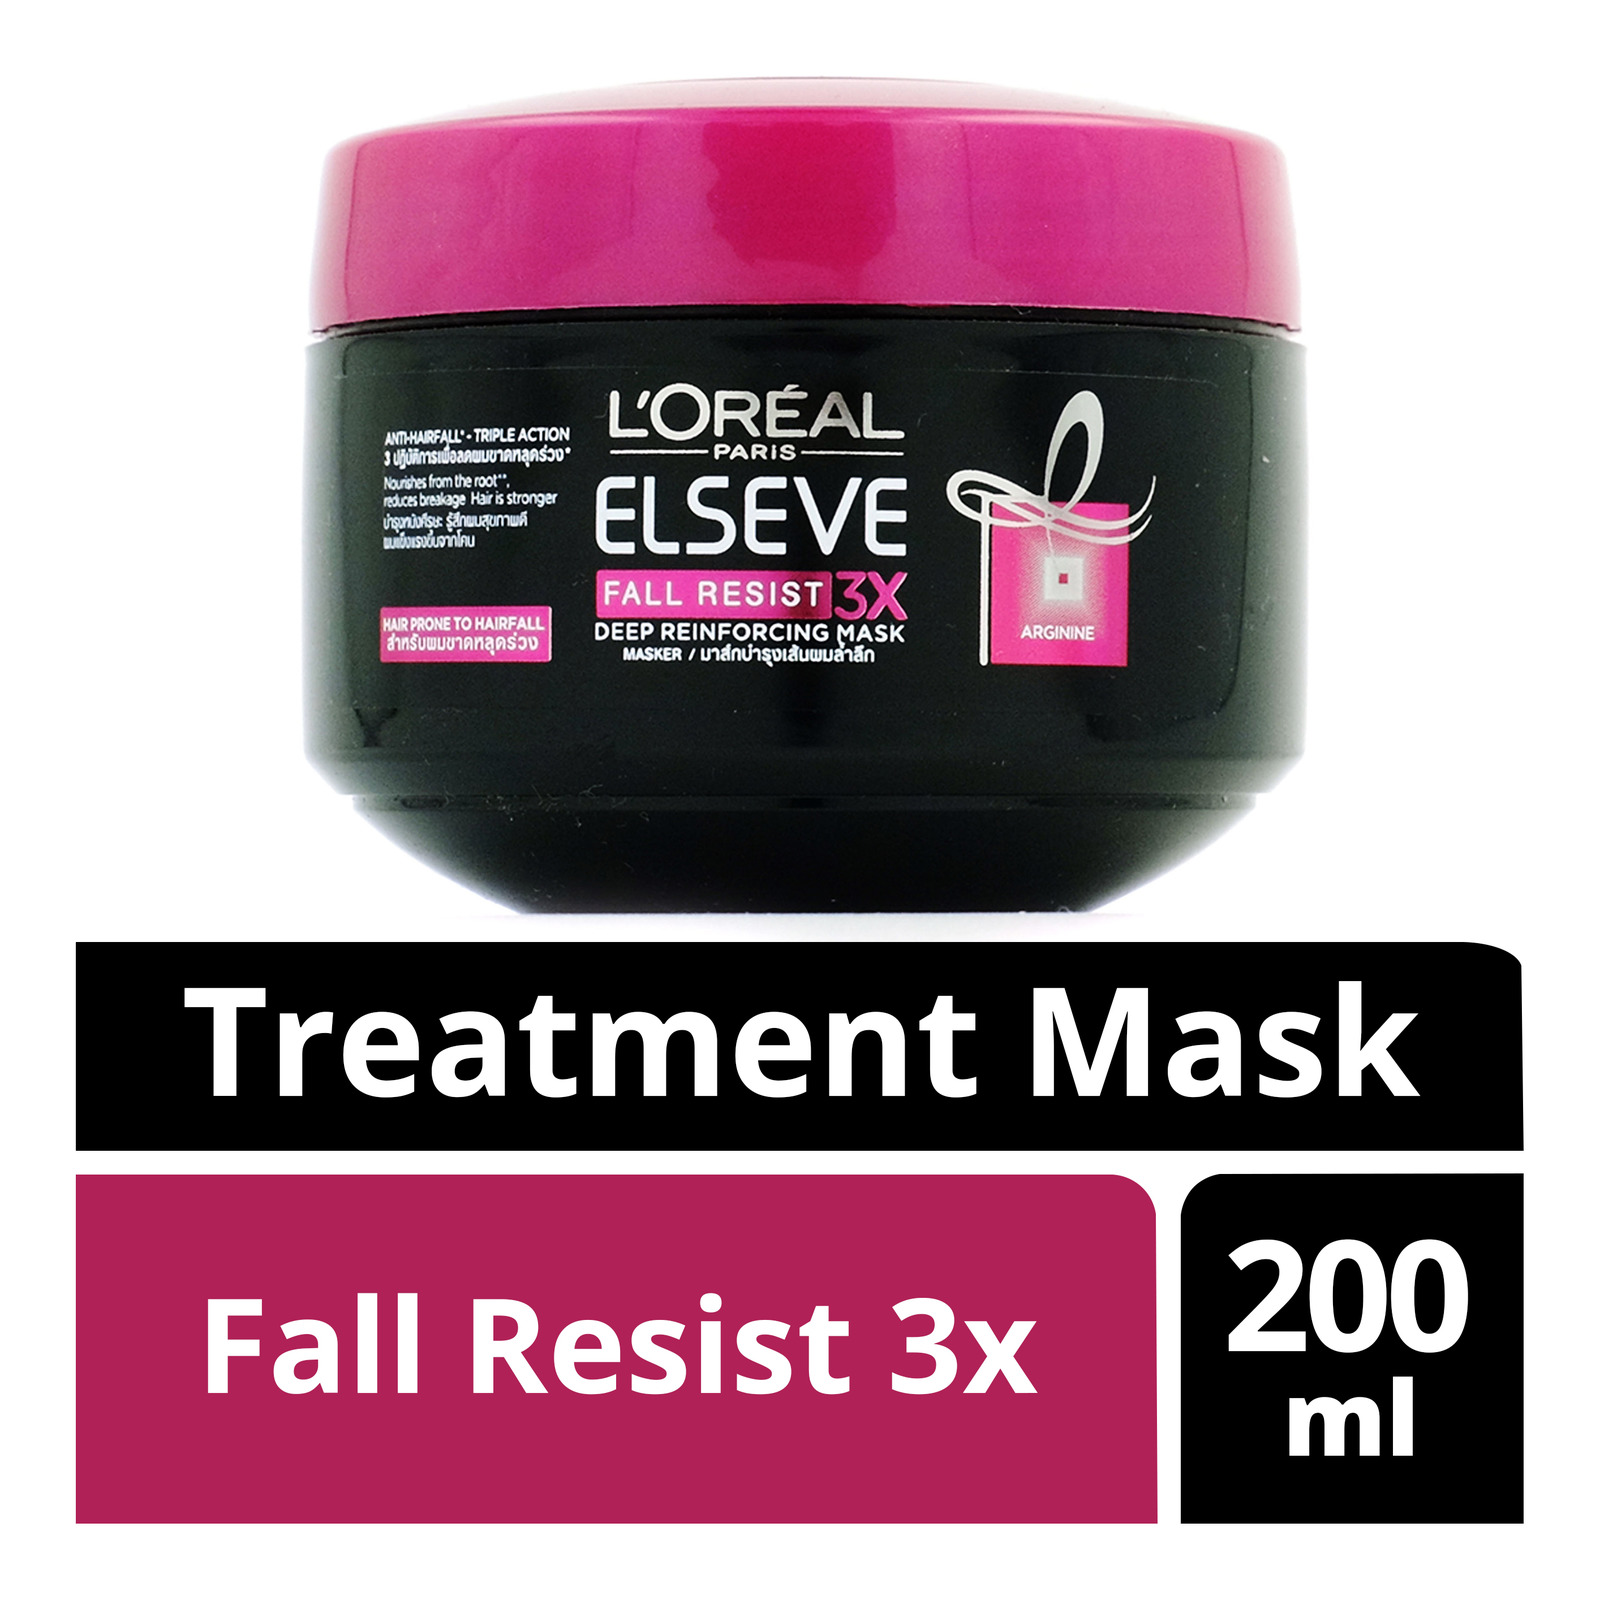 L'Oreal Paris Elseve Treatment Mask - Fall Resist 3x